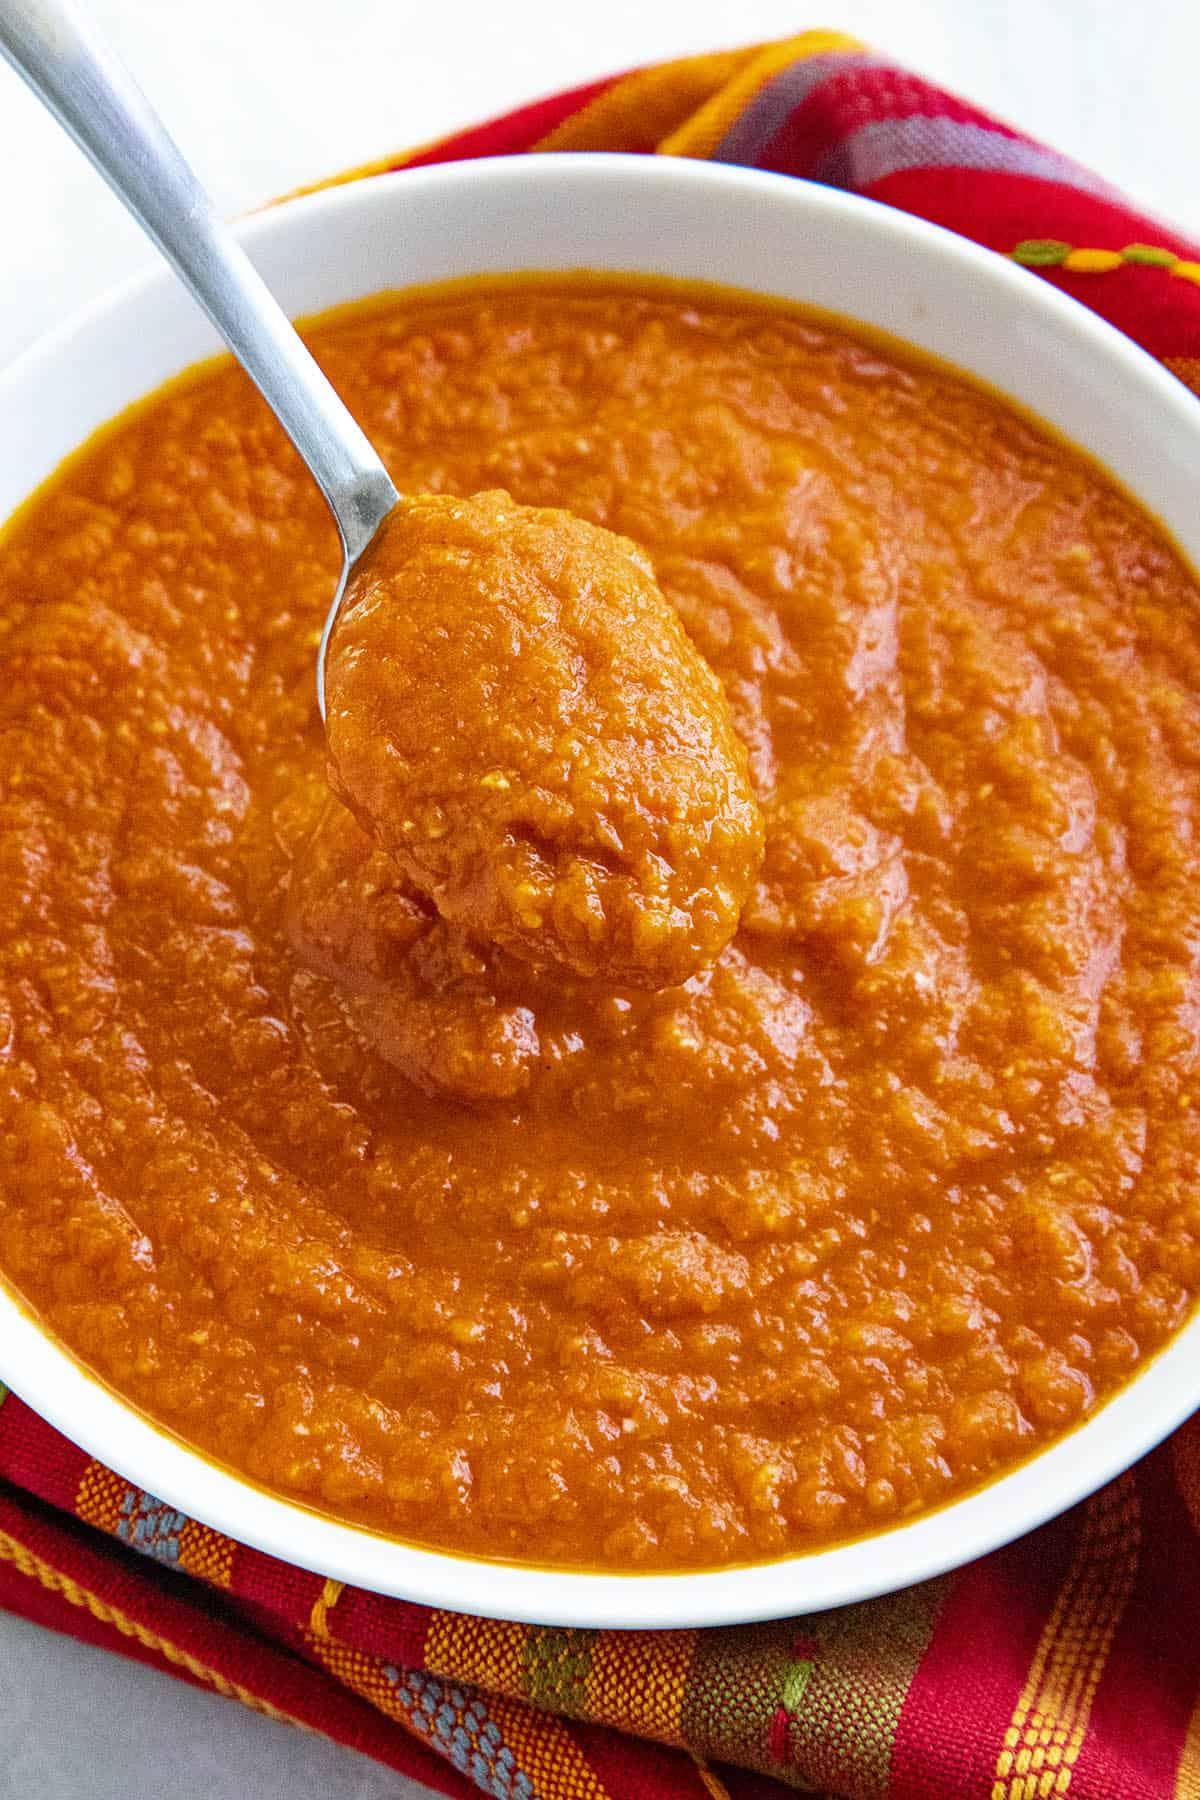 Bravas Sauce on a spoon, ready to serve